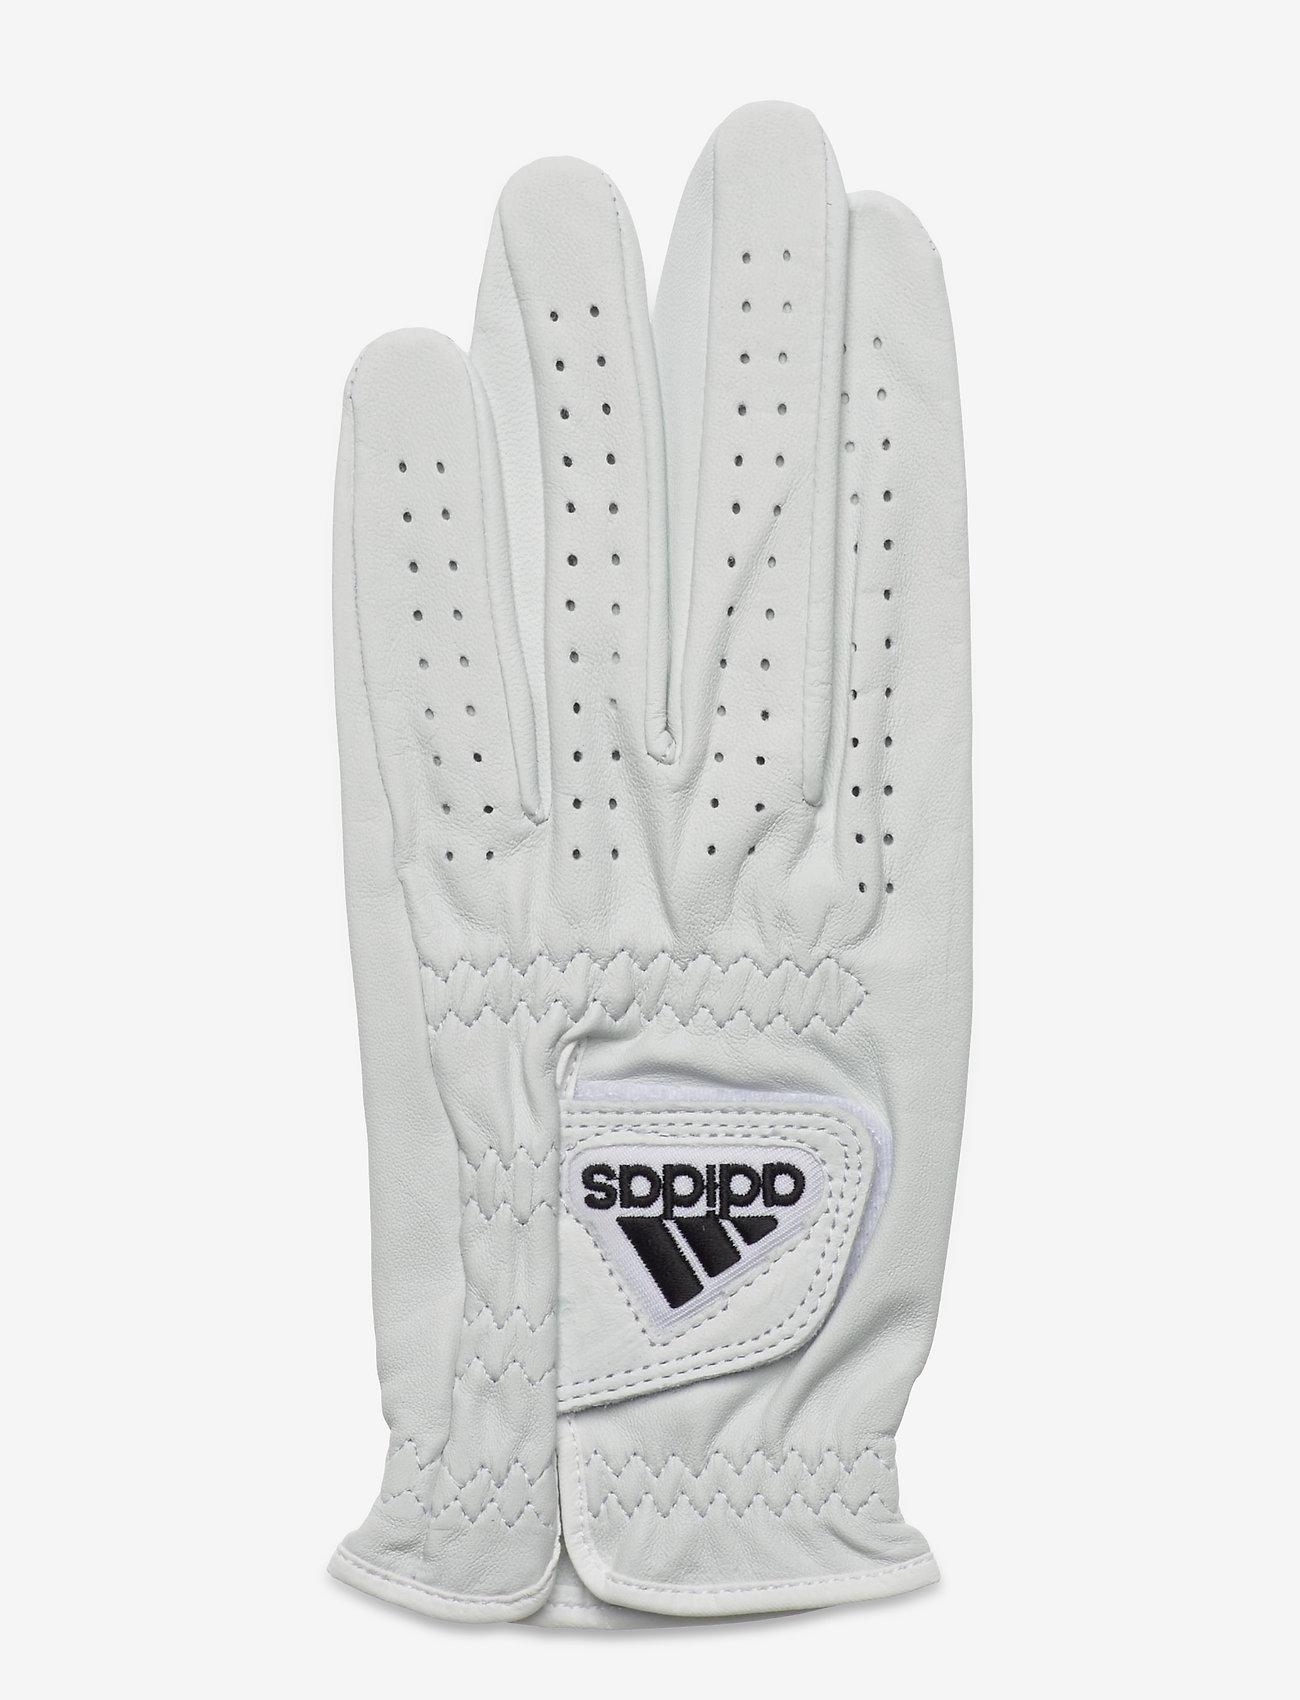 adidas Golf - LEATHER GLOVE - white/black - 0